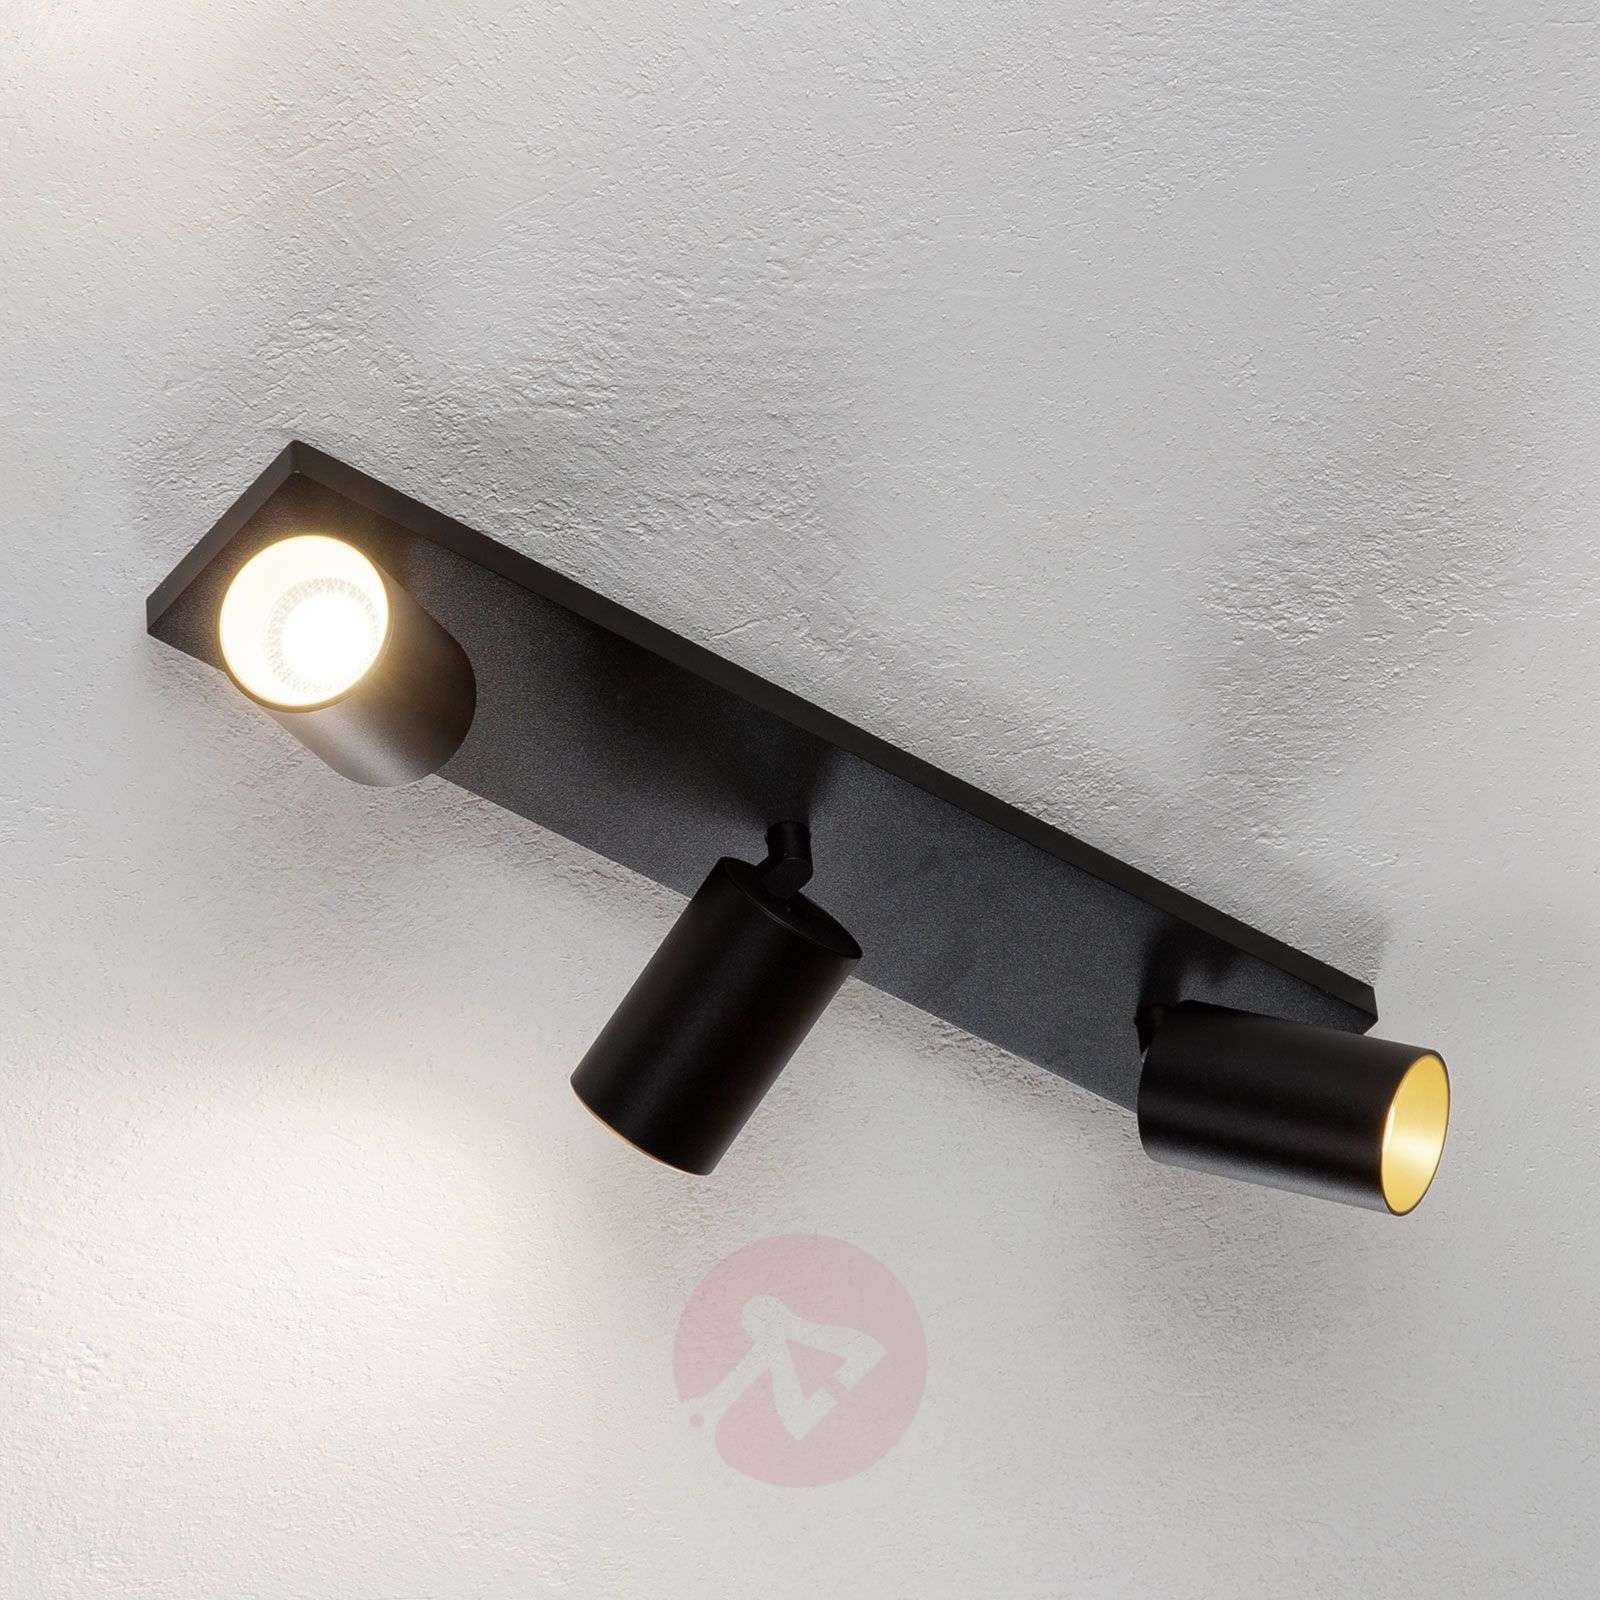 Kohdevalo Brinja GU10 musta 3 lamppua-9928019-01